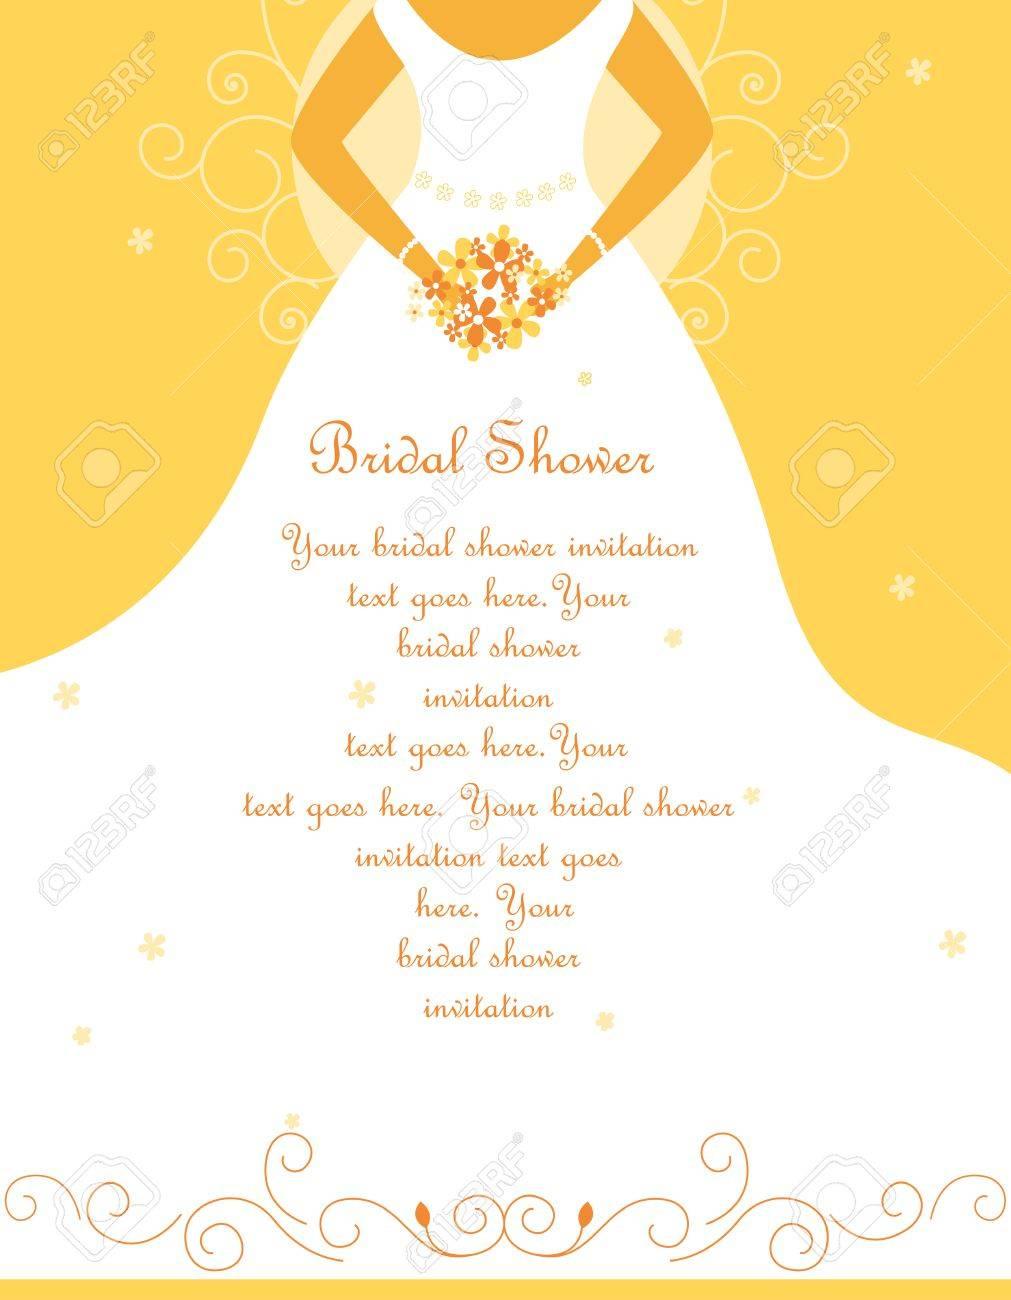 abstract anniversary art artistic artbridal shower wedding invitation card background with a beauti work backdrop backgroundbeautiful beauty